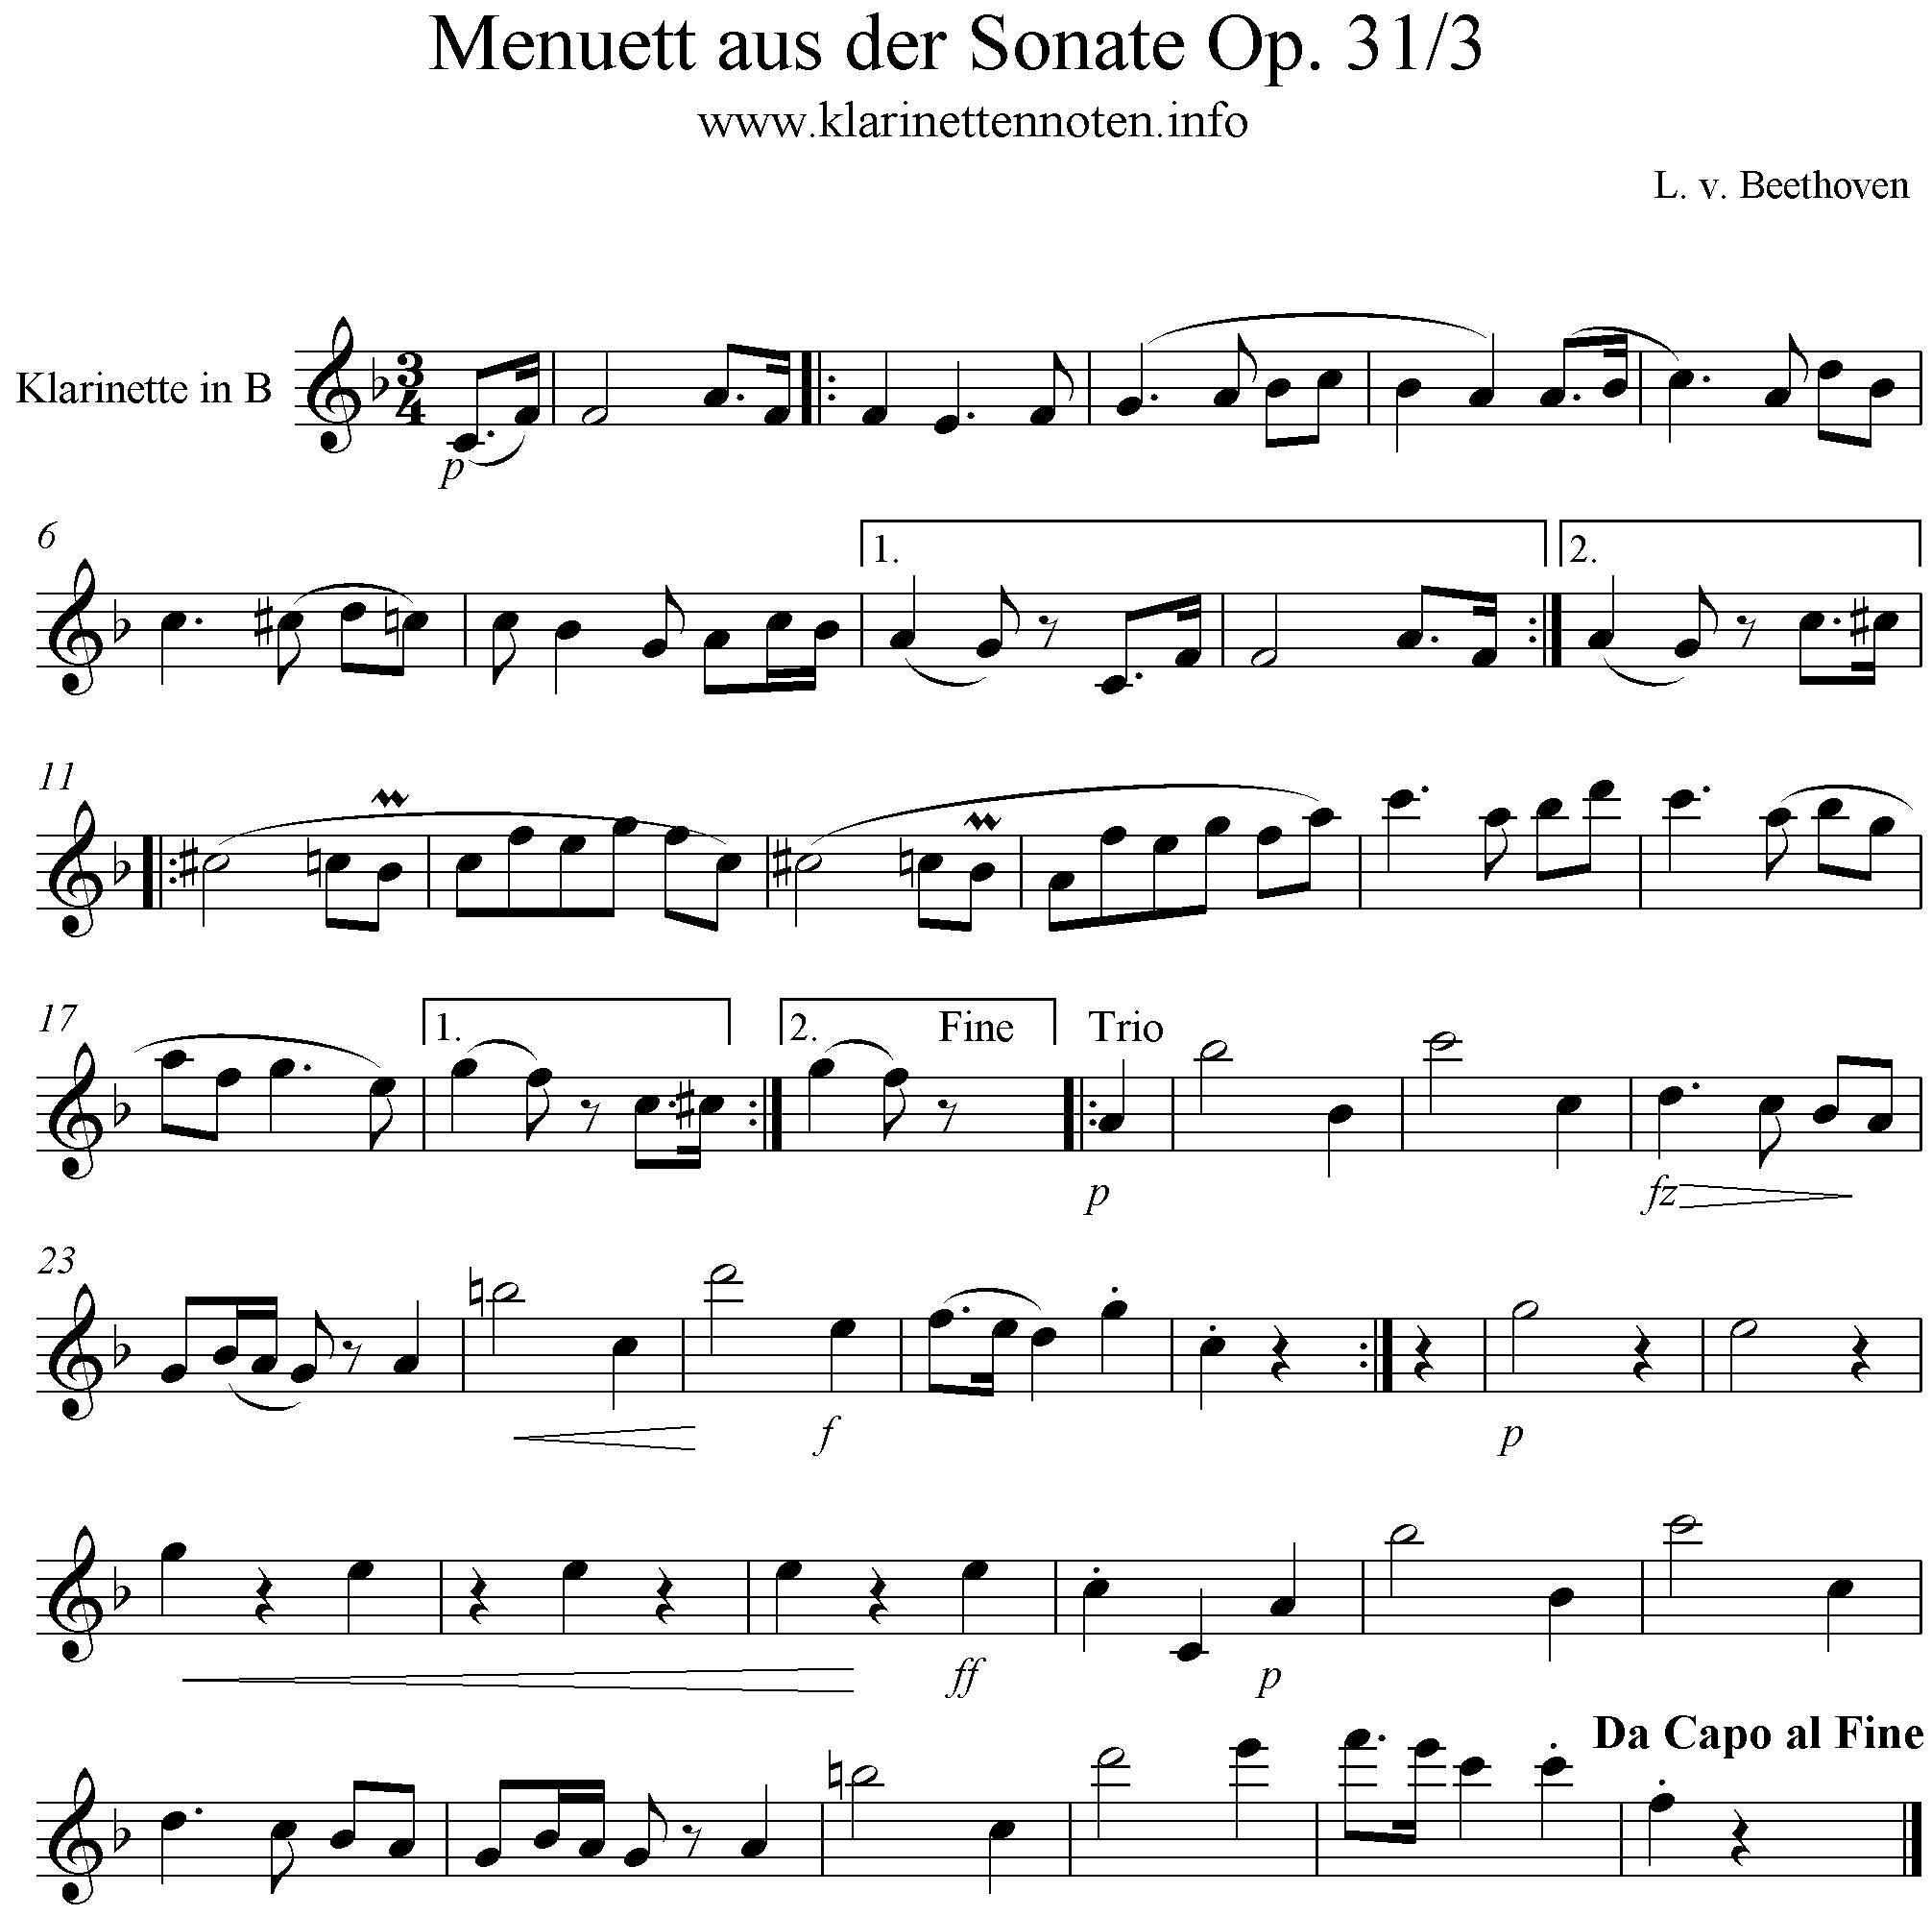 Menuet aus sonate op. 31/3 Solopart